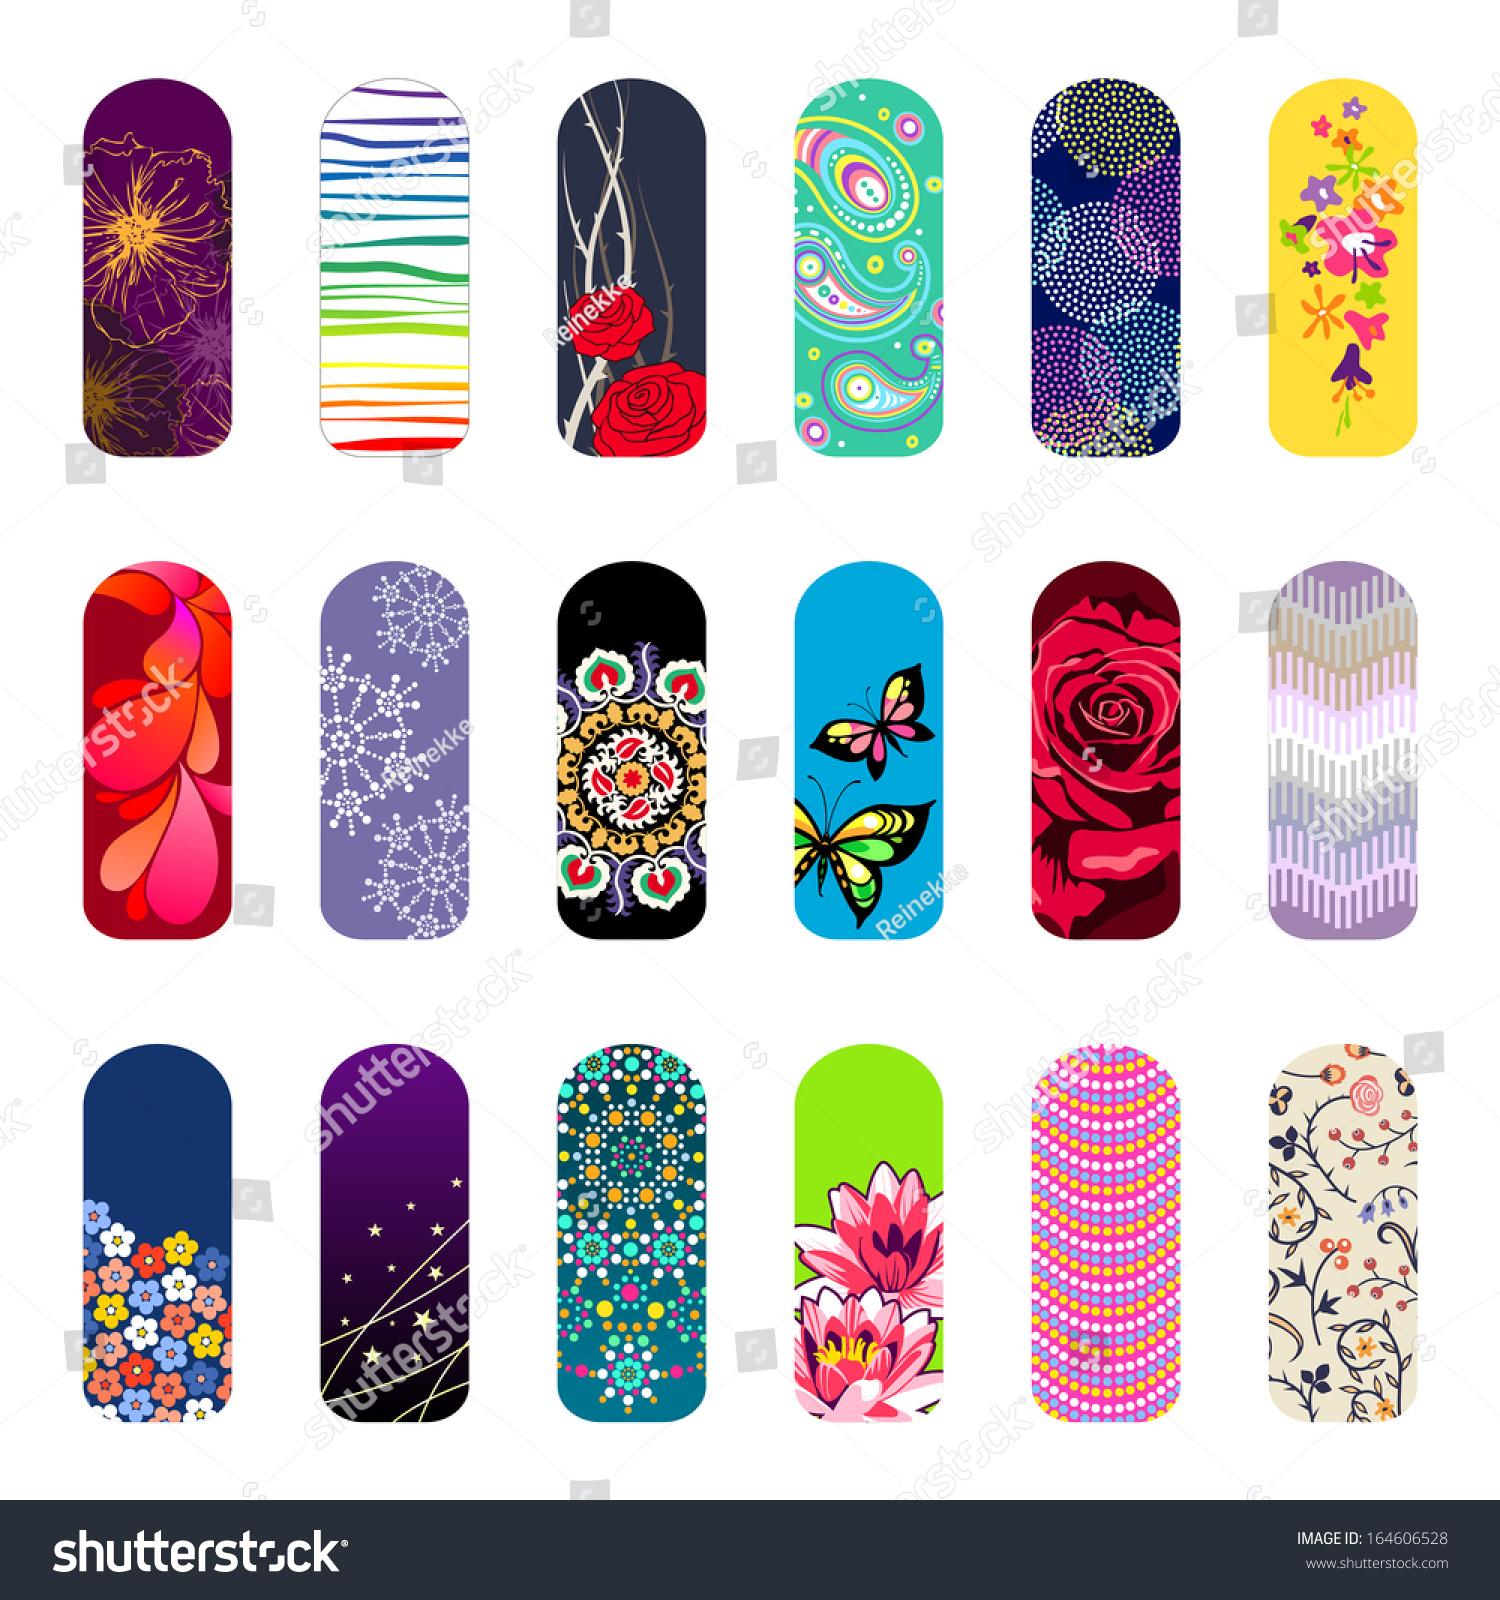 Nails Art Beauty Salon Background Stock Vector: Set Of Nail Art Designs For Beauty Salon Stock Vector